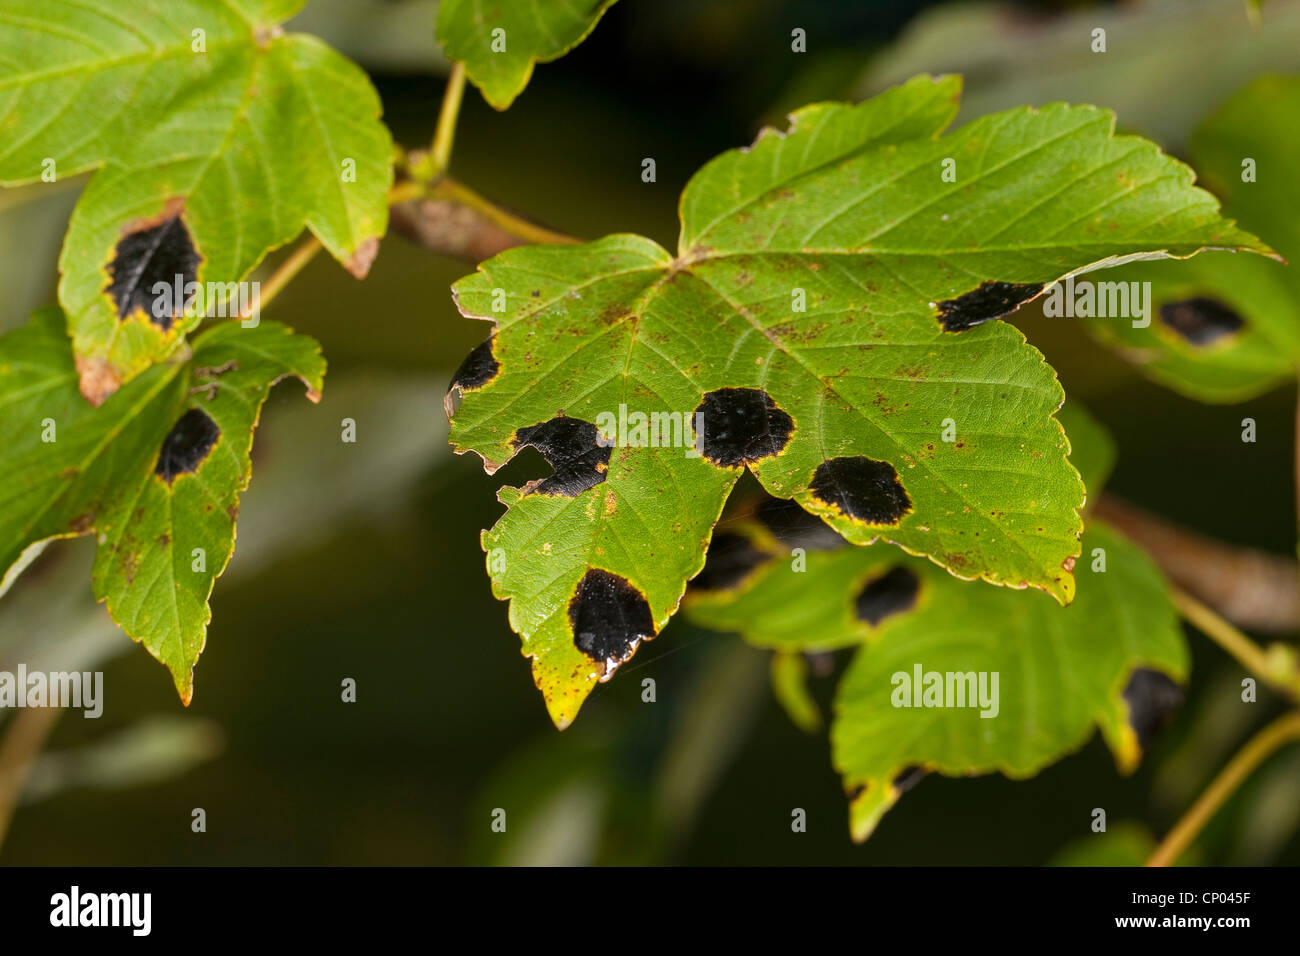 sycamore tarspot (Rhytisma acerinum), plant pathogen on Acer pseudoplatanus, Germany - Stock Image